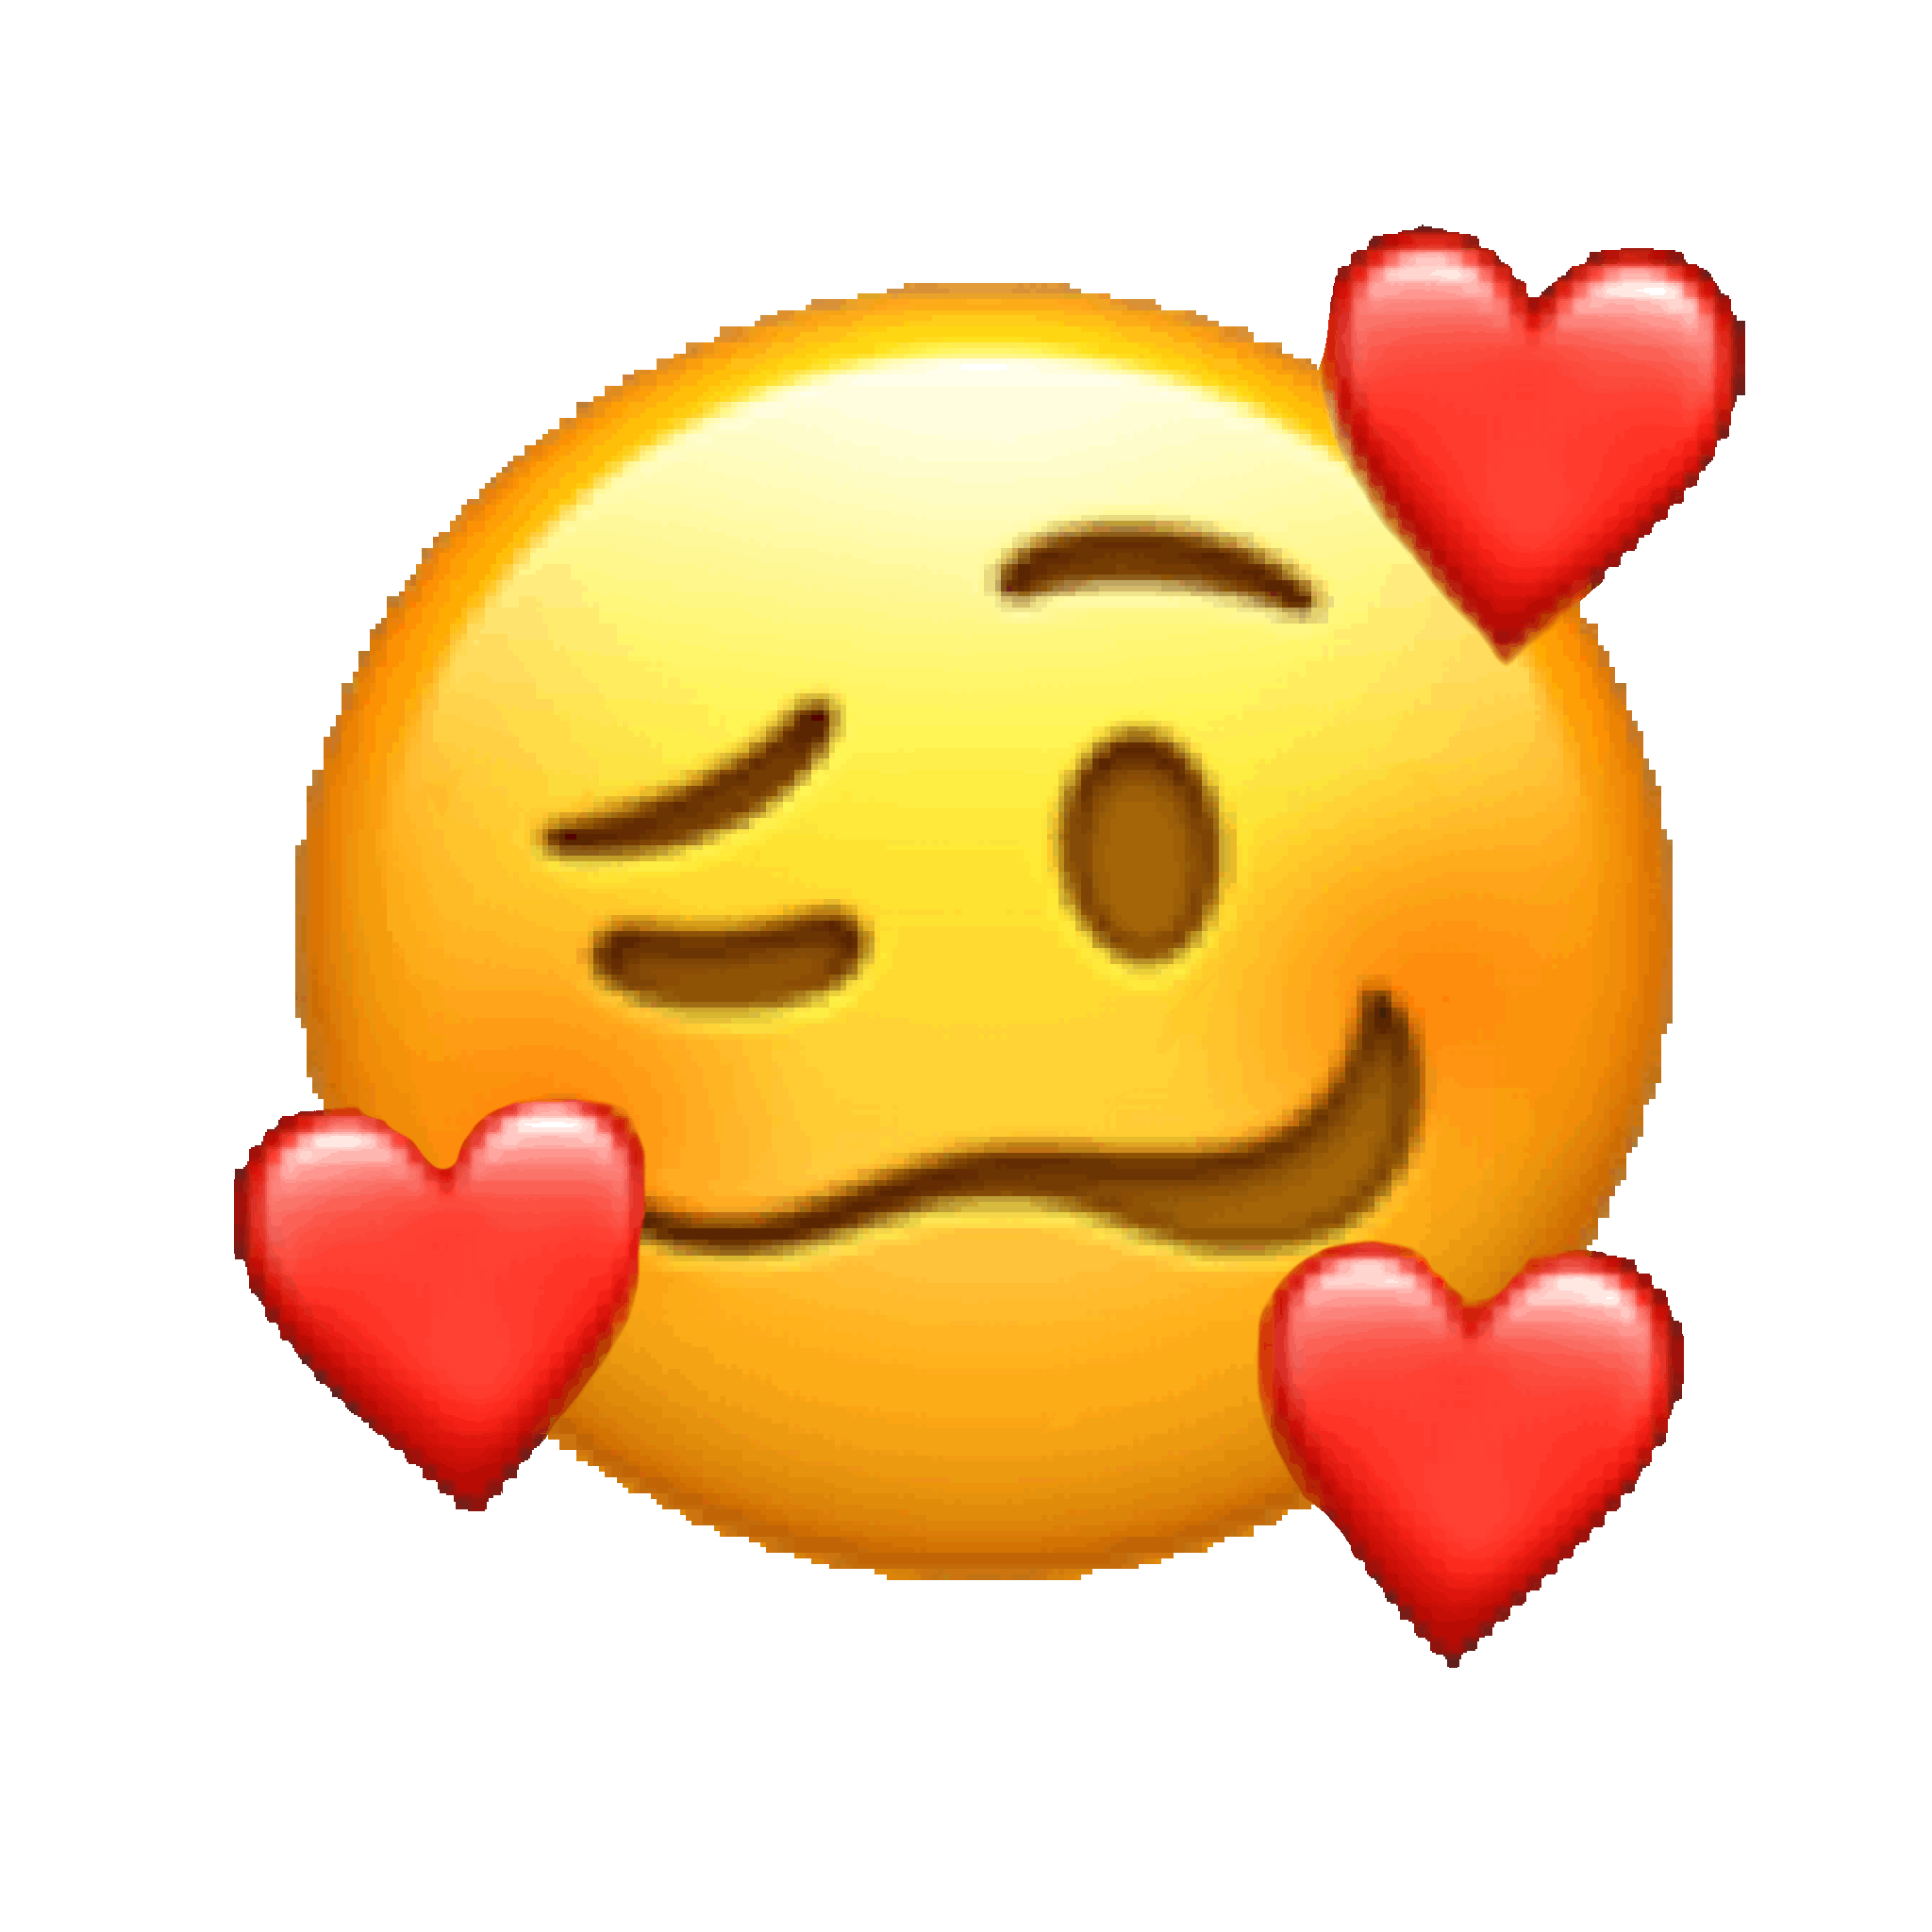 Freetoedit Mixed Emojis Woozy In Love Weird Remixit Emoji Emoji Combinations Image Stickers